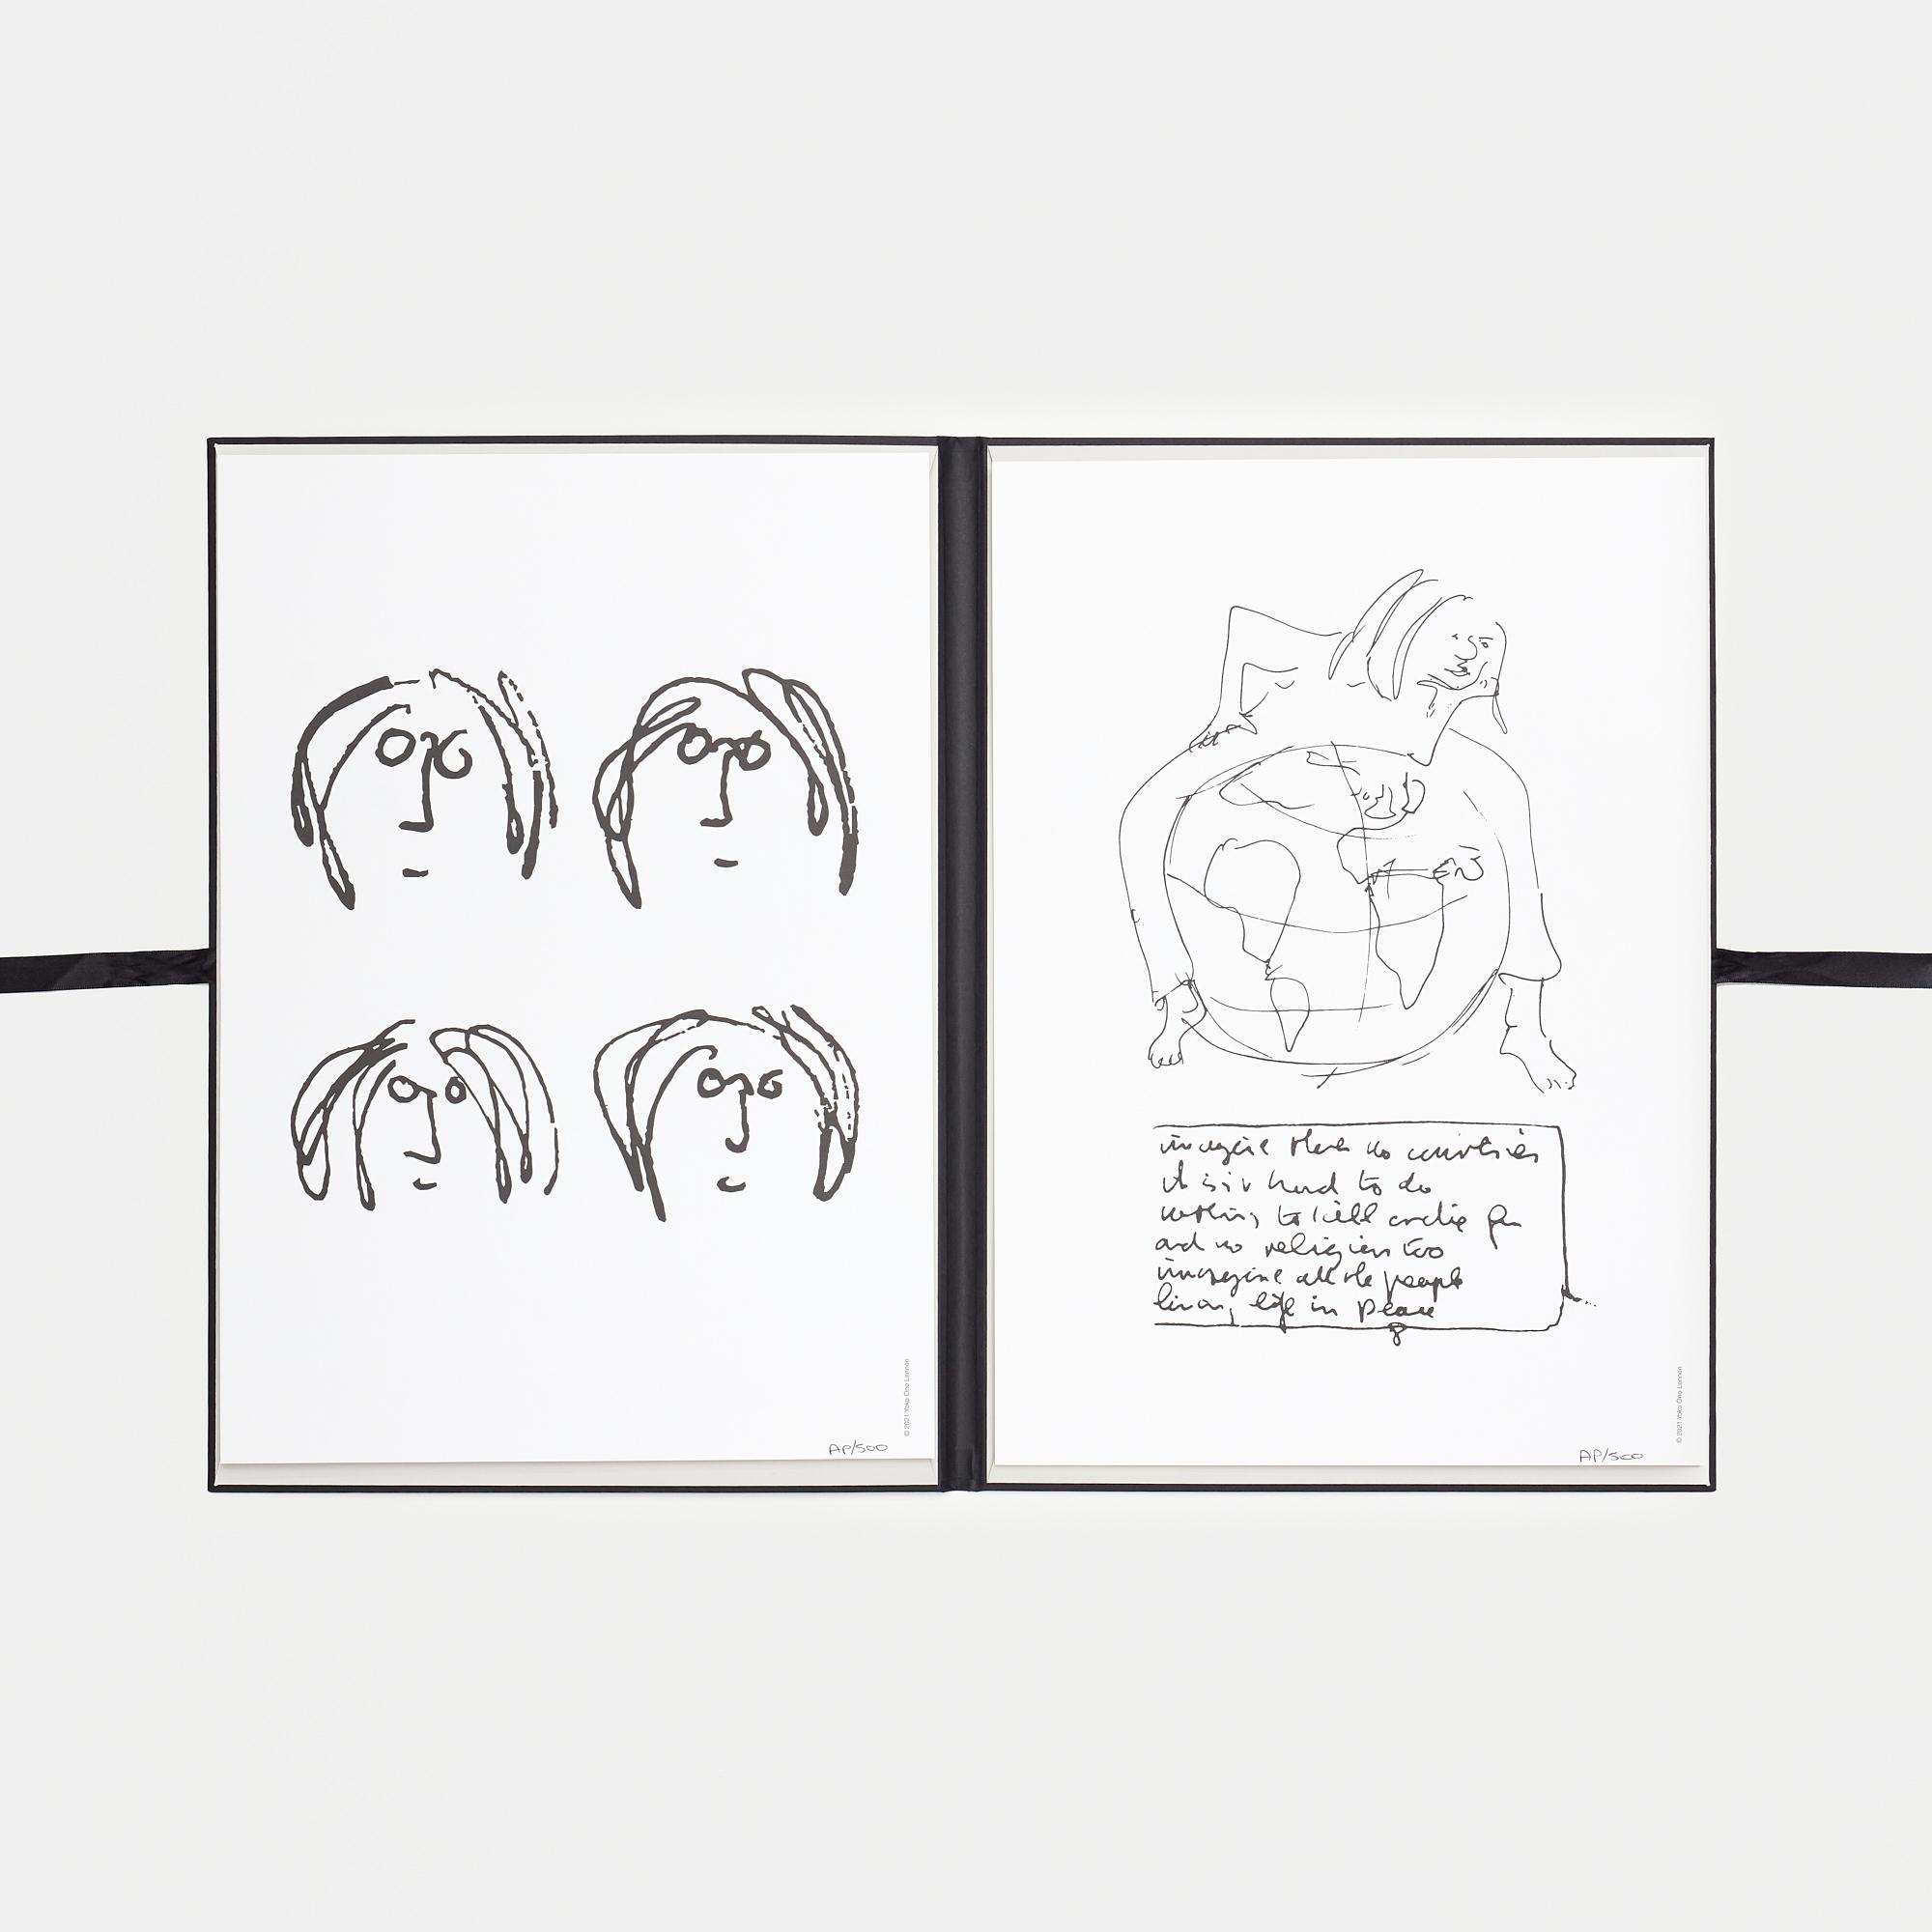 **John Lennon** ***Imagine*** Folio in collaboration with *Yoko Ono Lennon*